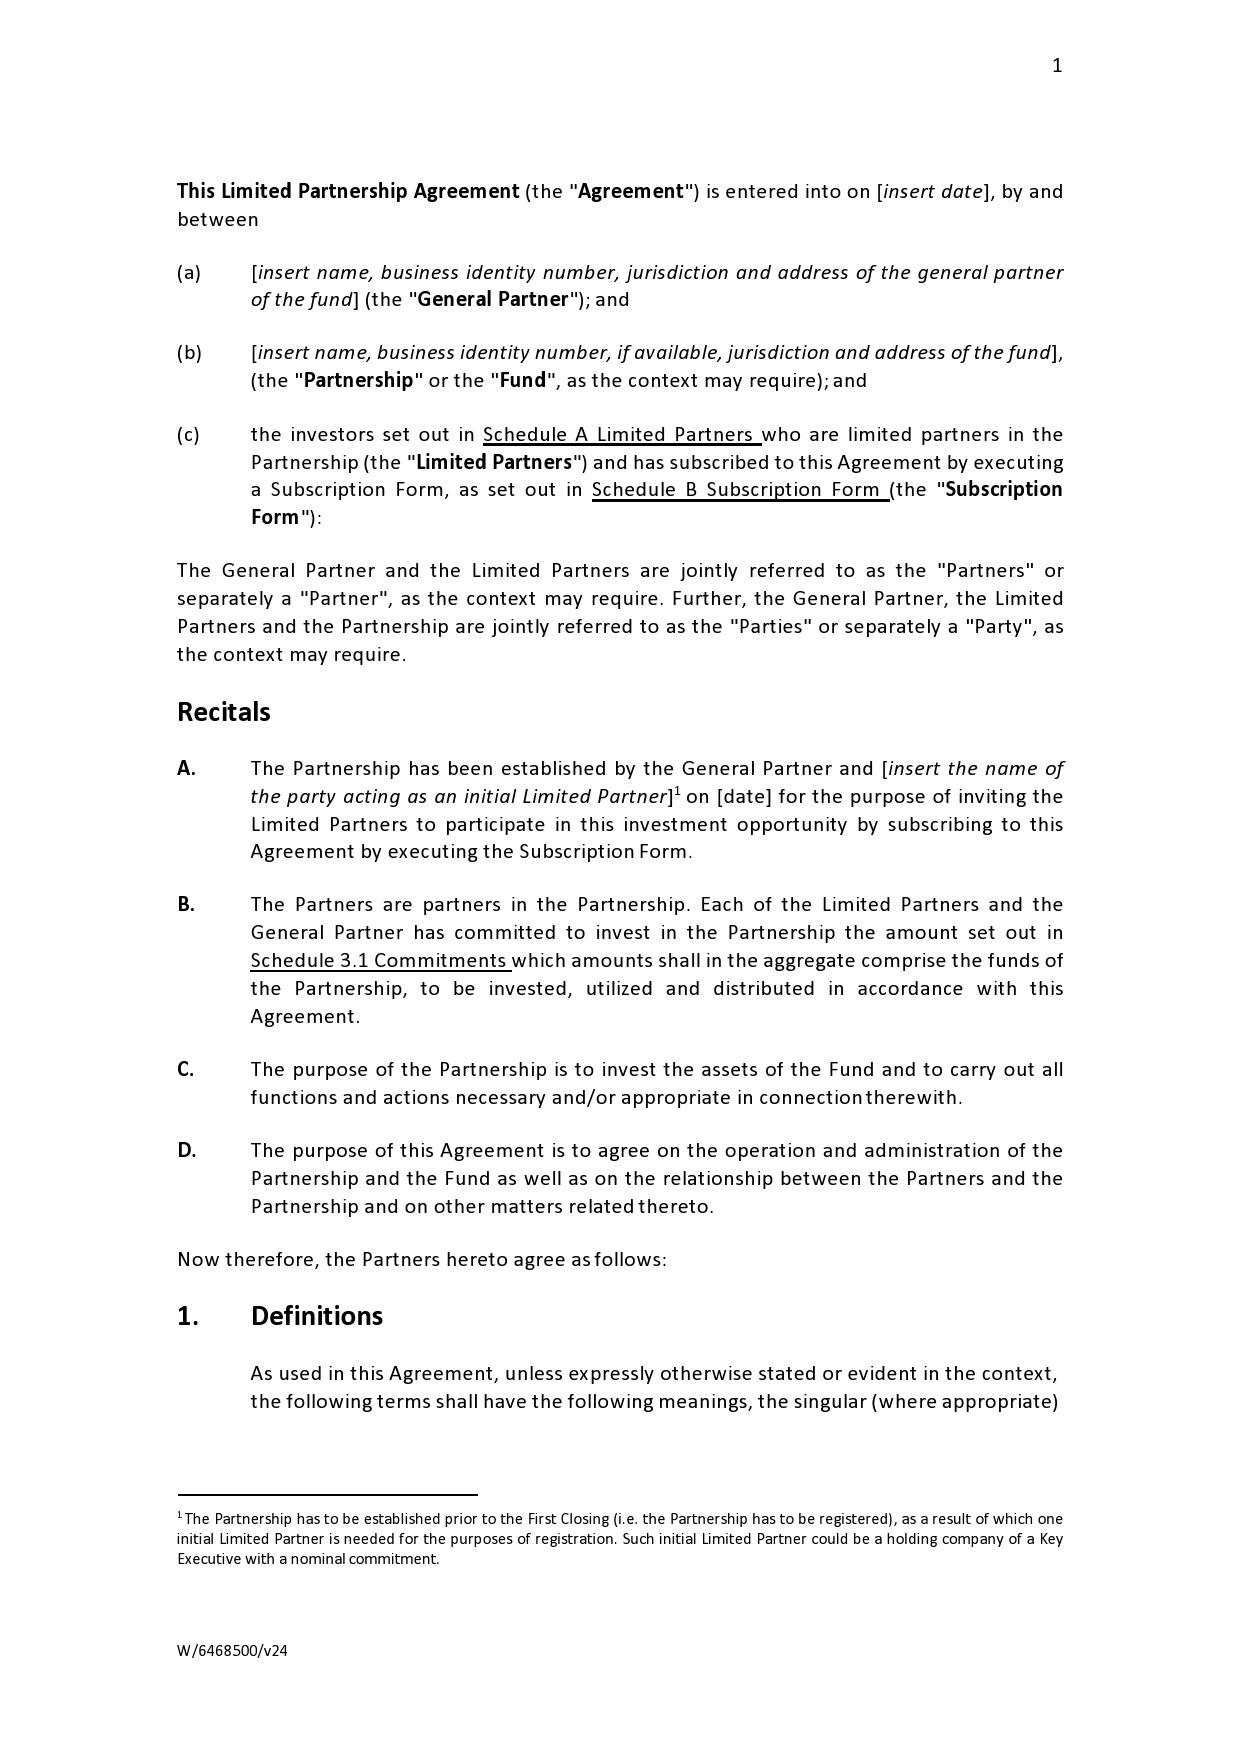 Free limited partnership agreement 20